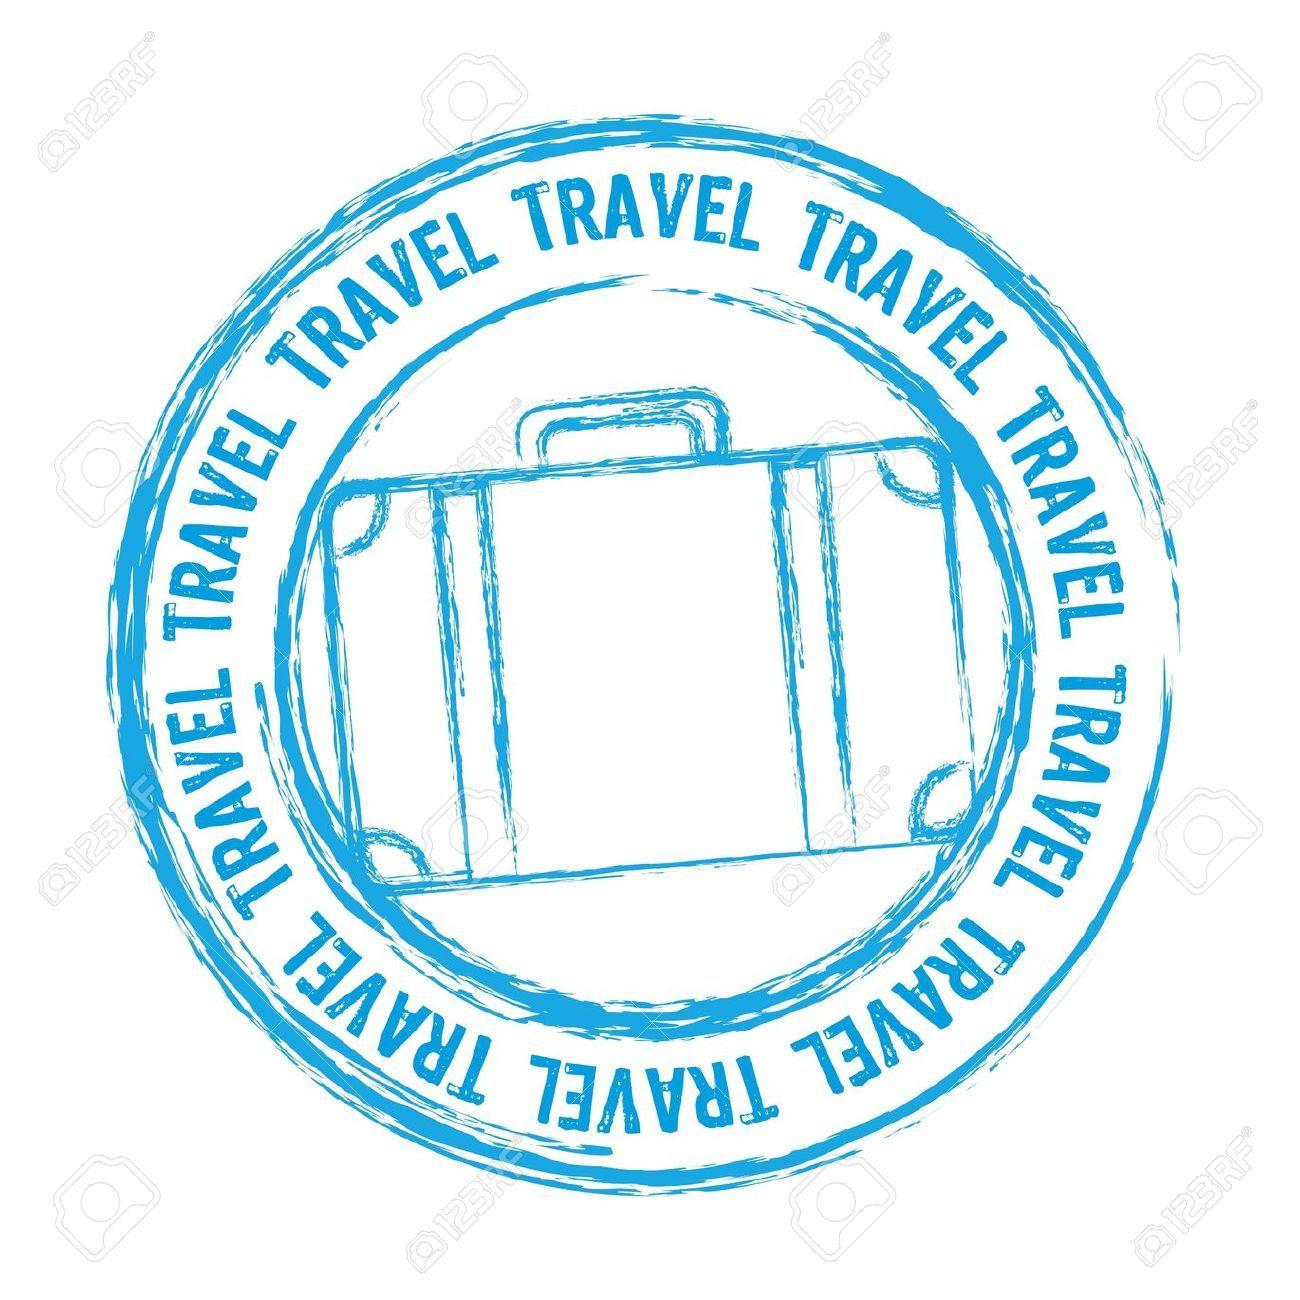 Passport symbol clipart free Passport Cliparts, Stock Vector And Royalty Free Passport ... free